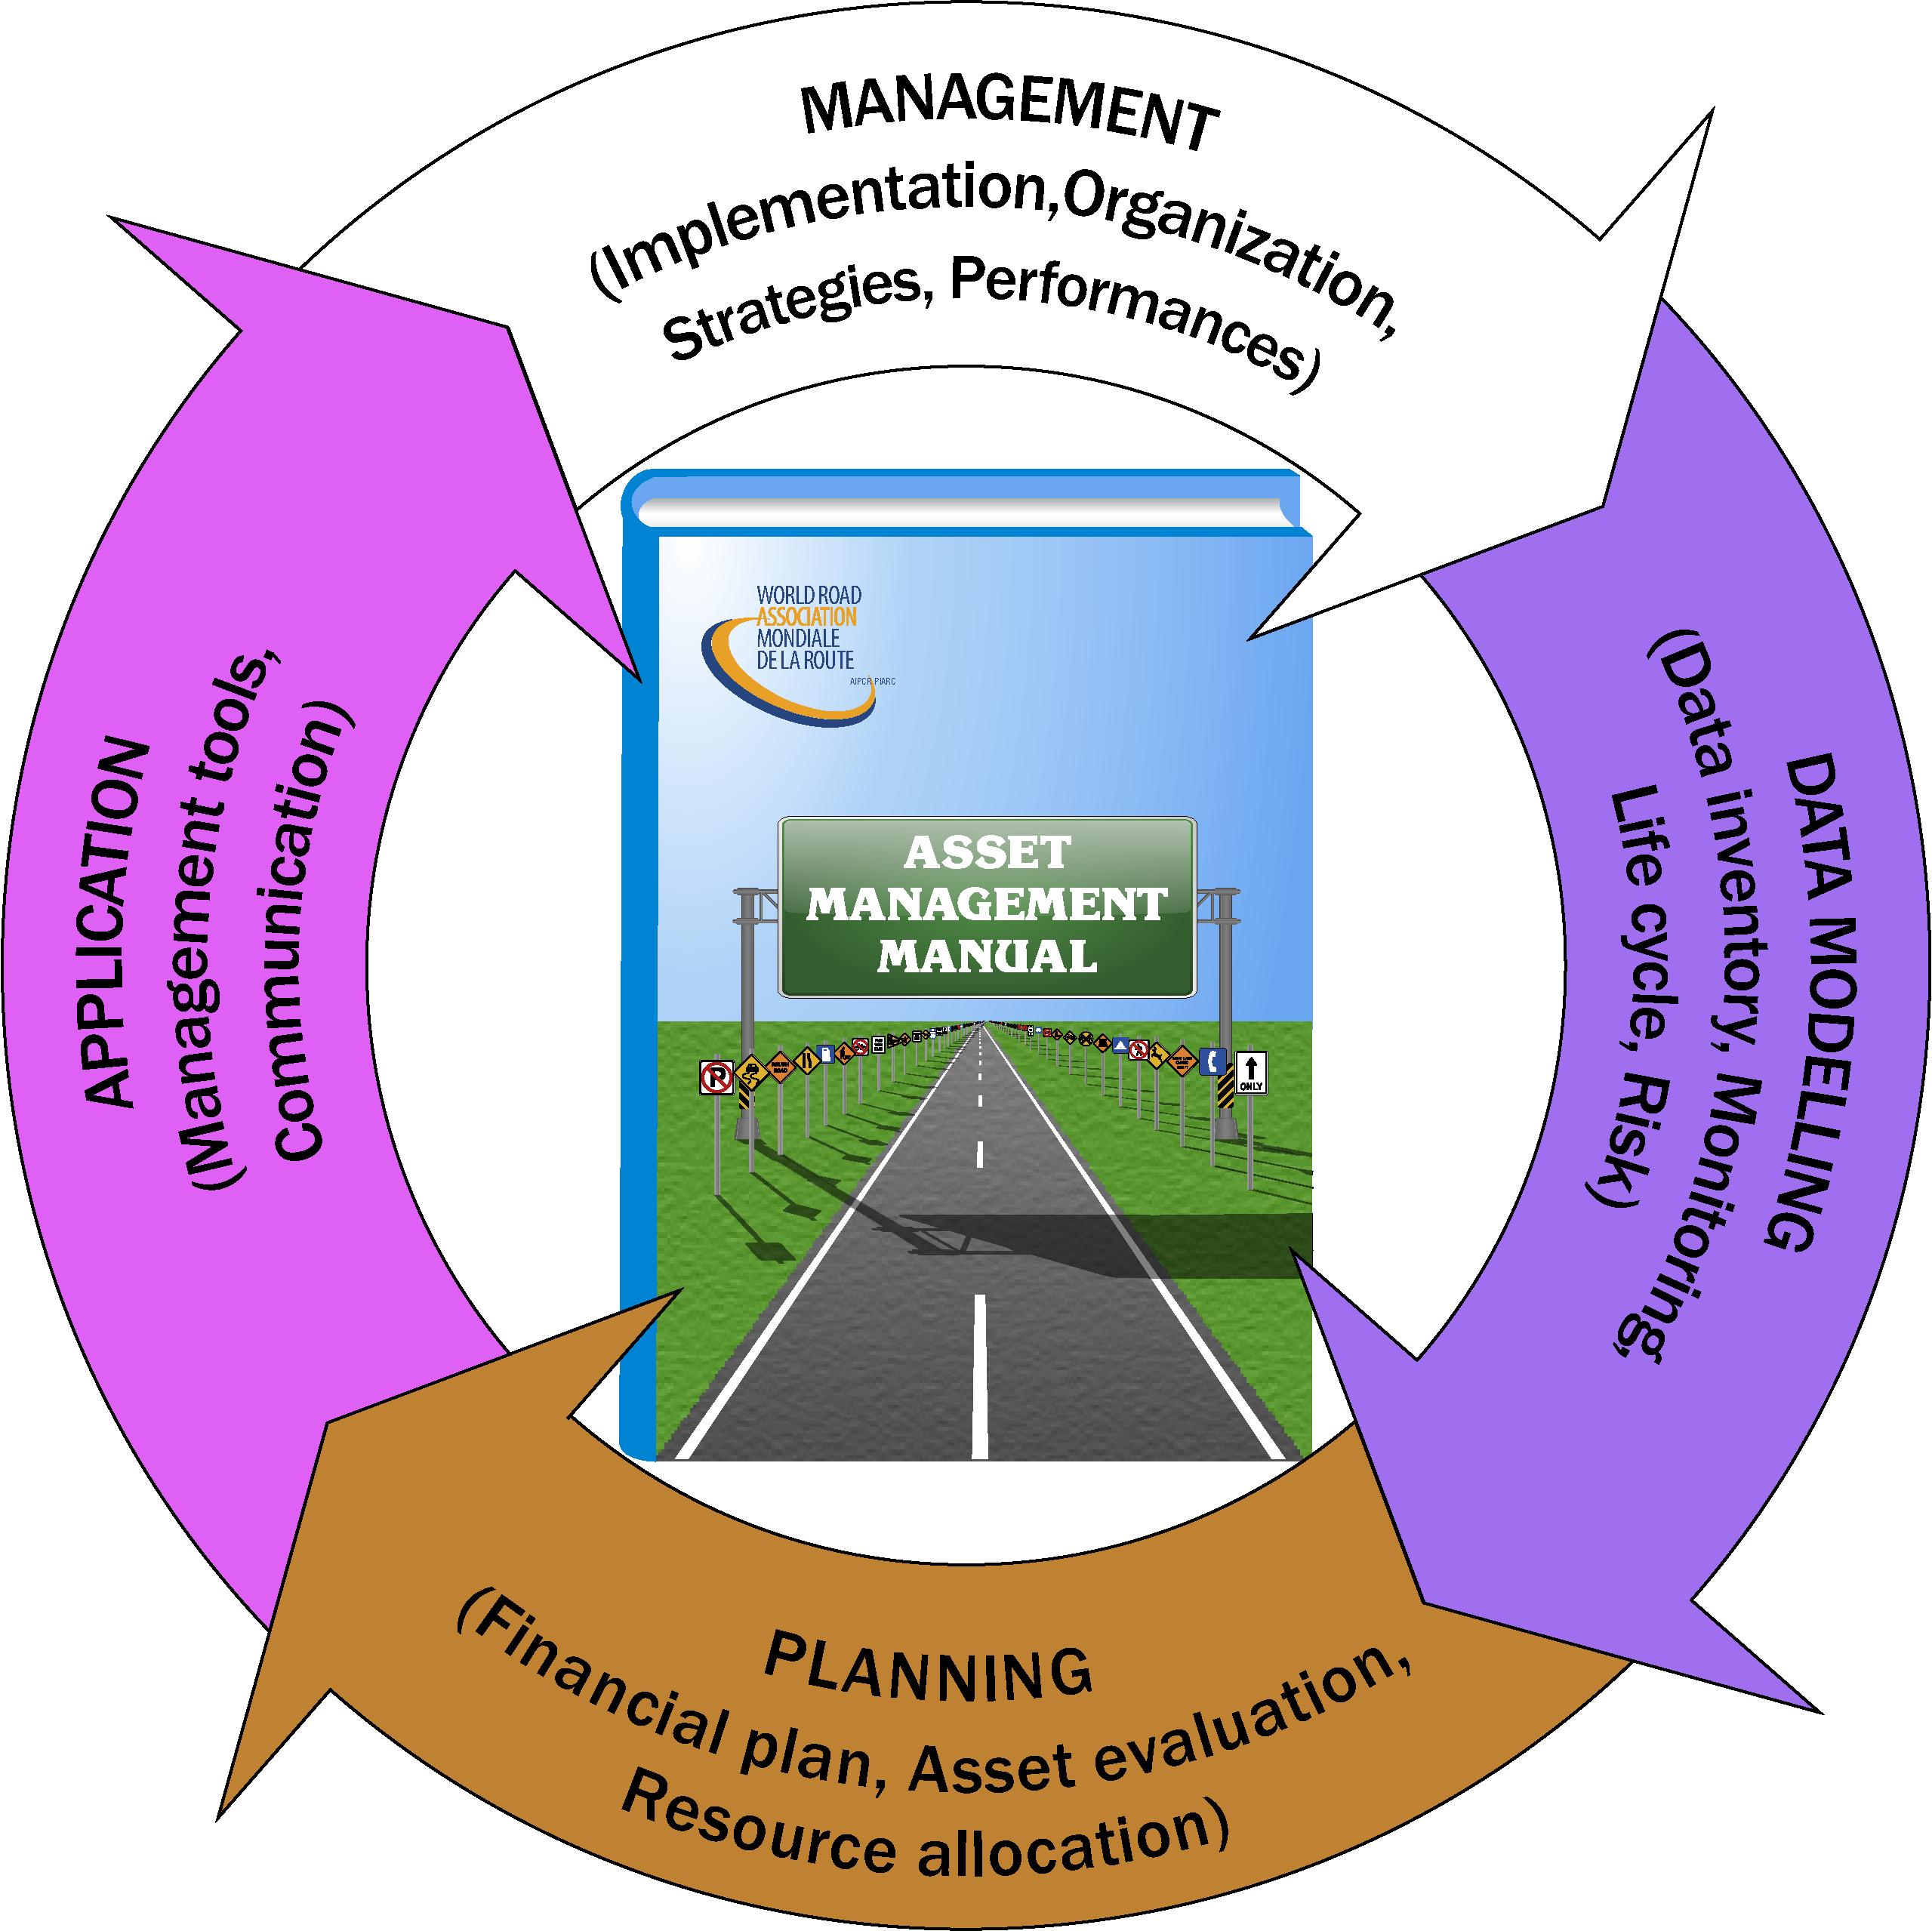 Asset Management Manual.